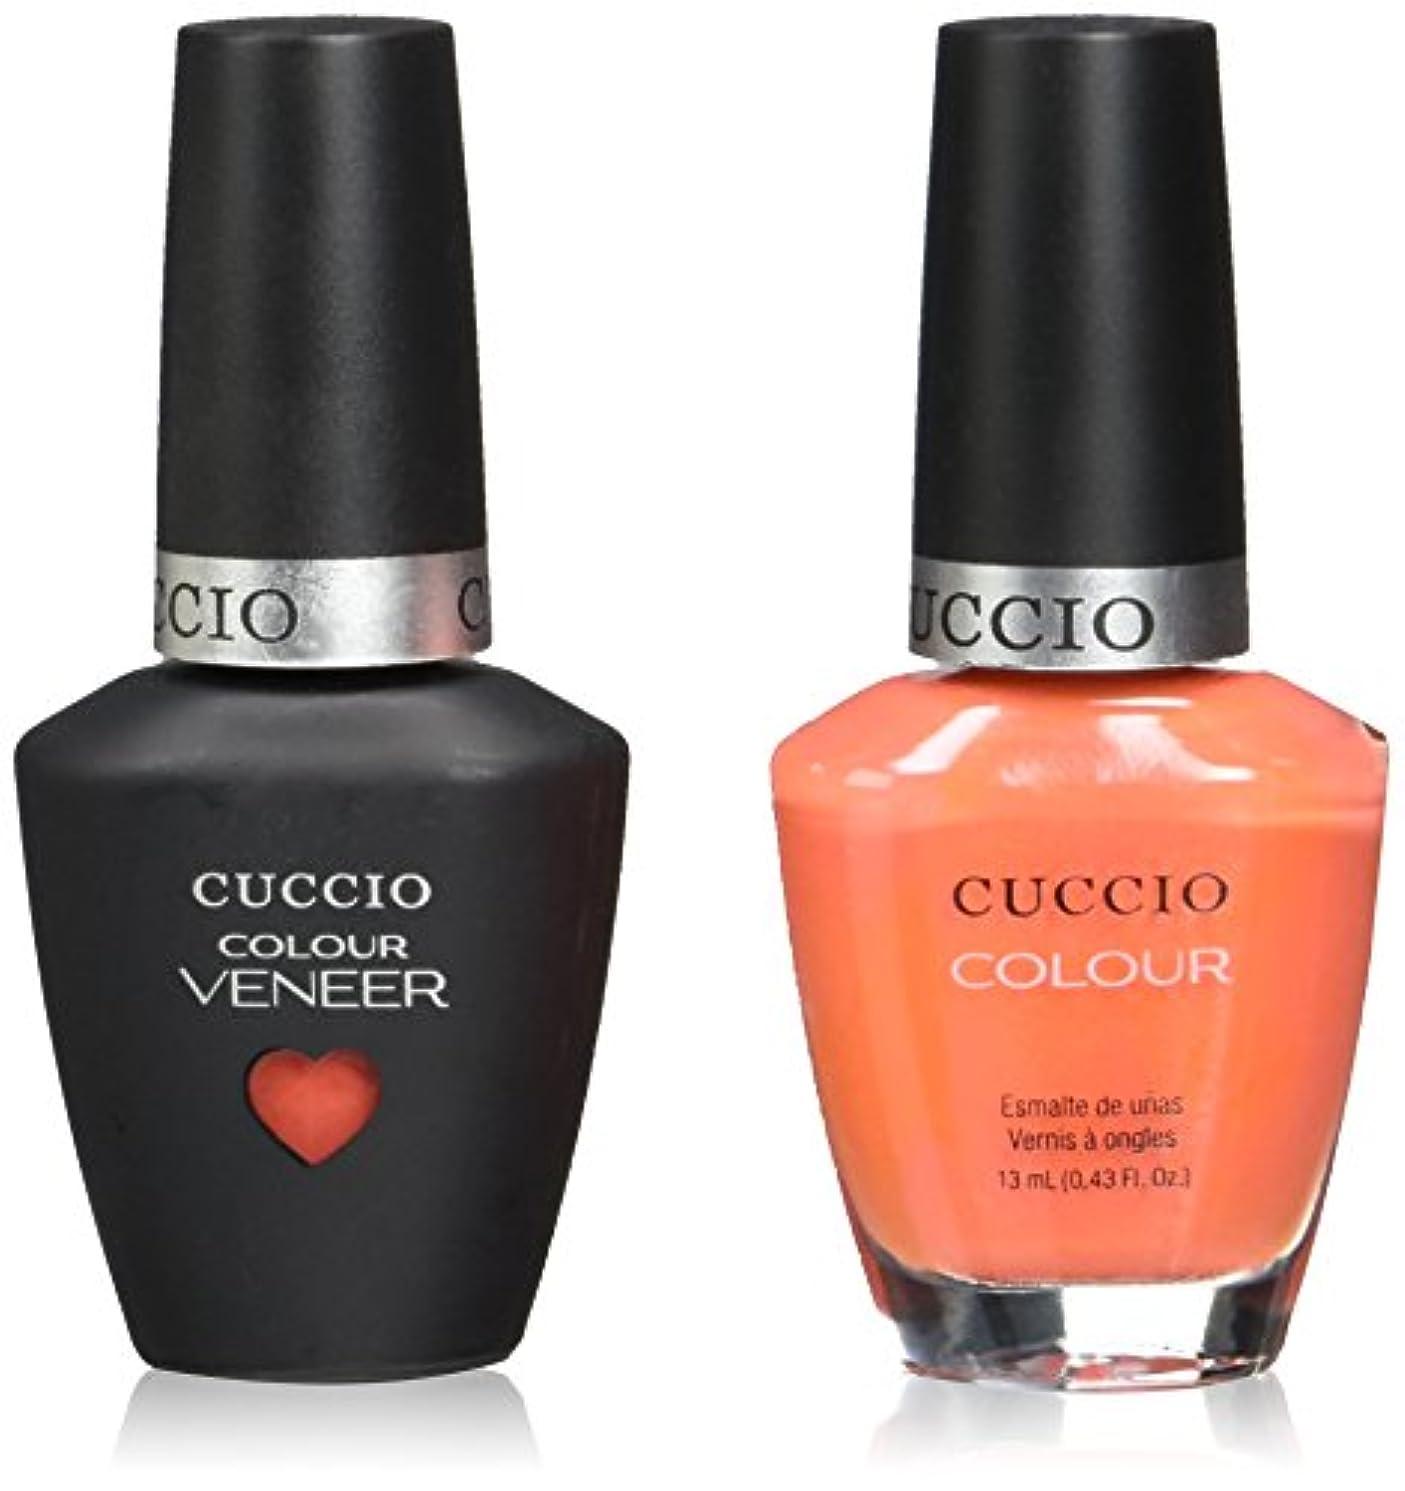 Cuccio MatchMakers Veneer & Lacquer - California Dreamin - 0.43oz / 13ml Each